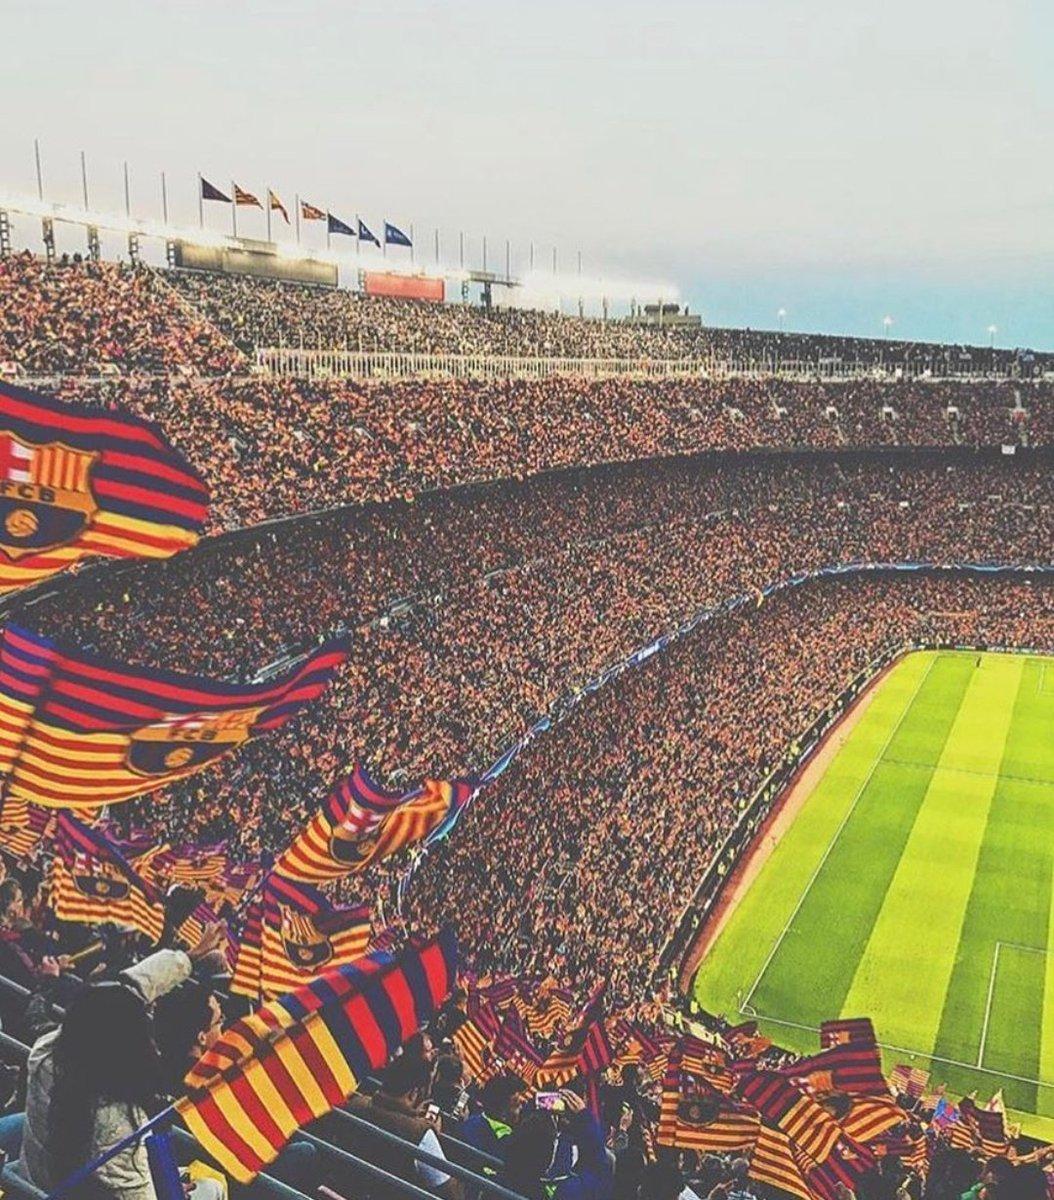 RT @UNIVERSO_1899: Hoy toca Barça 😍 https://t.co/LppKppCsh0